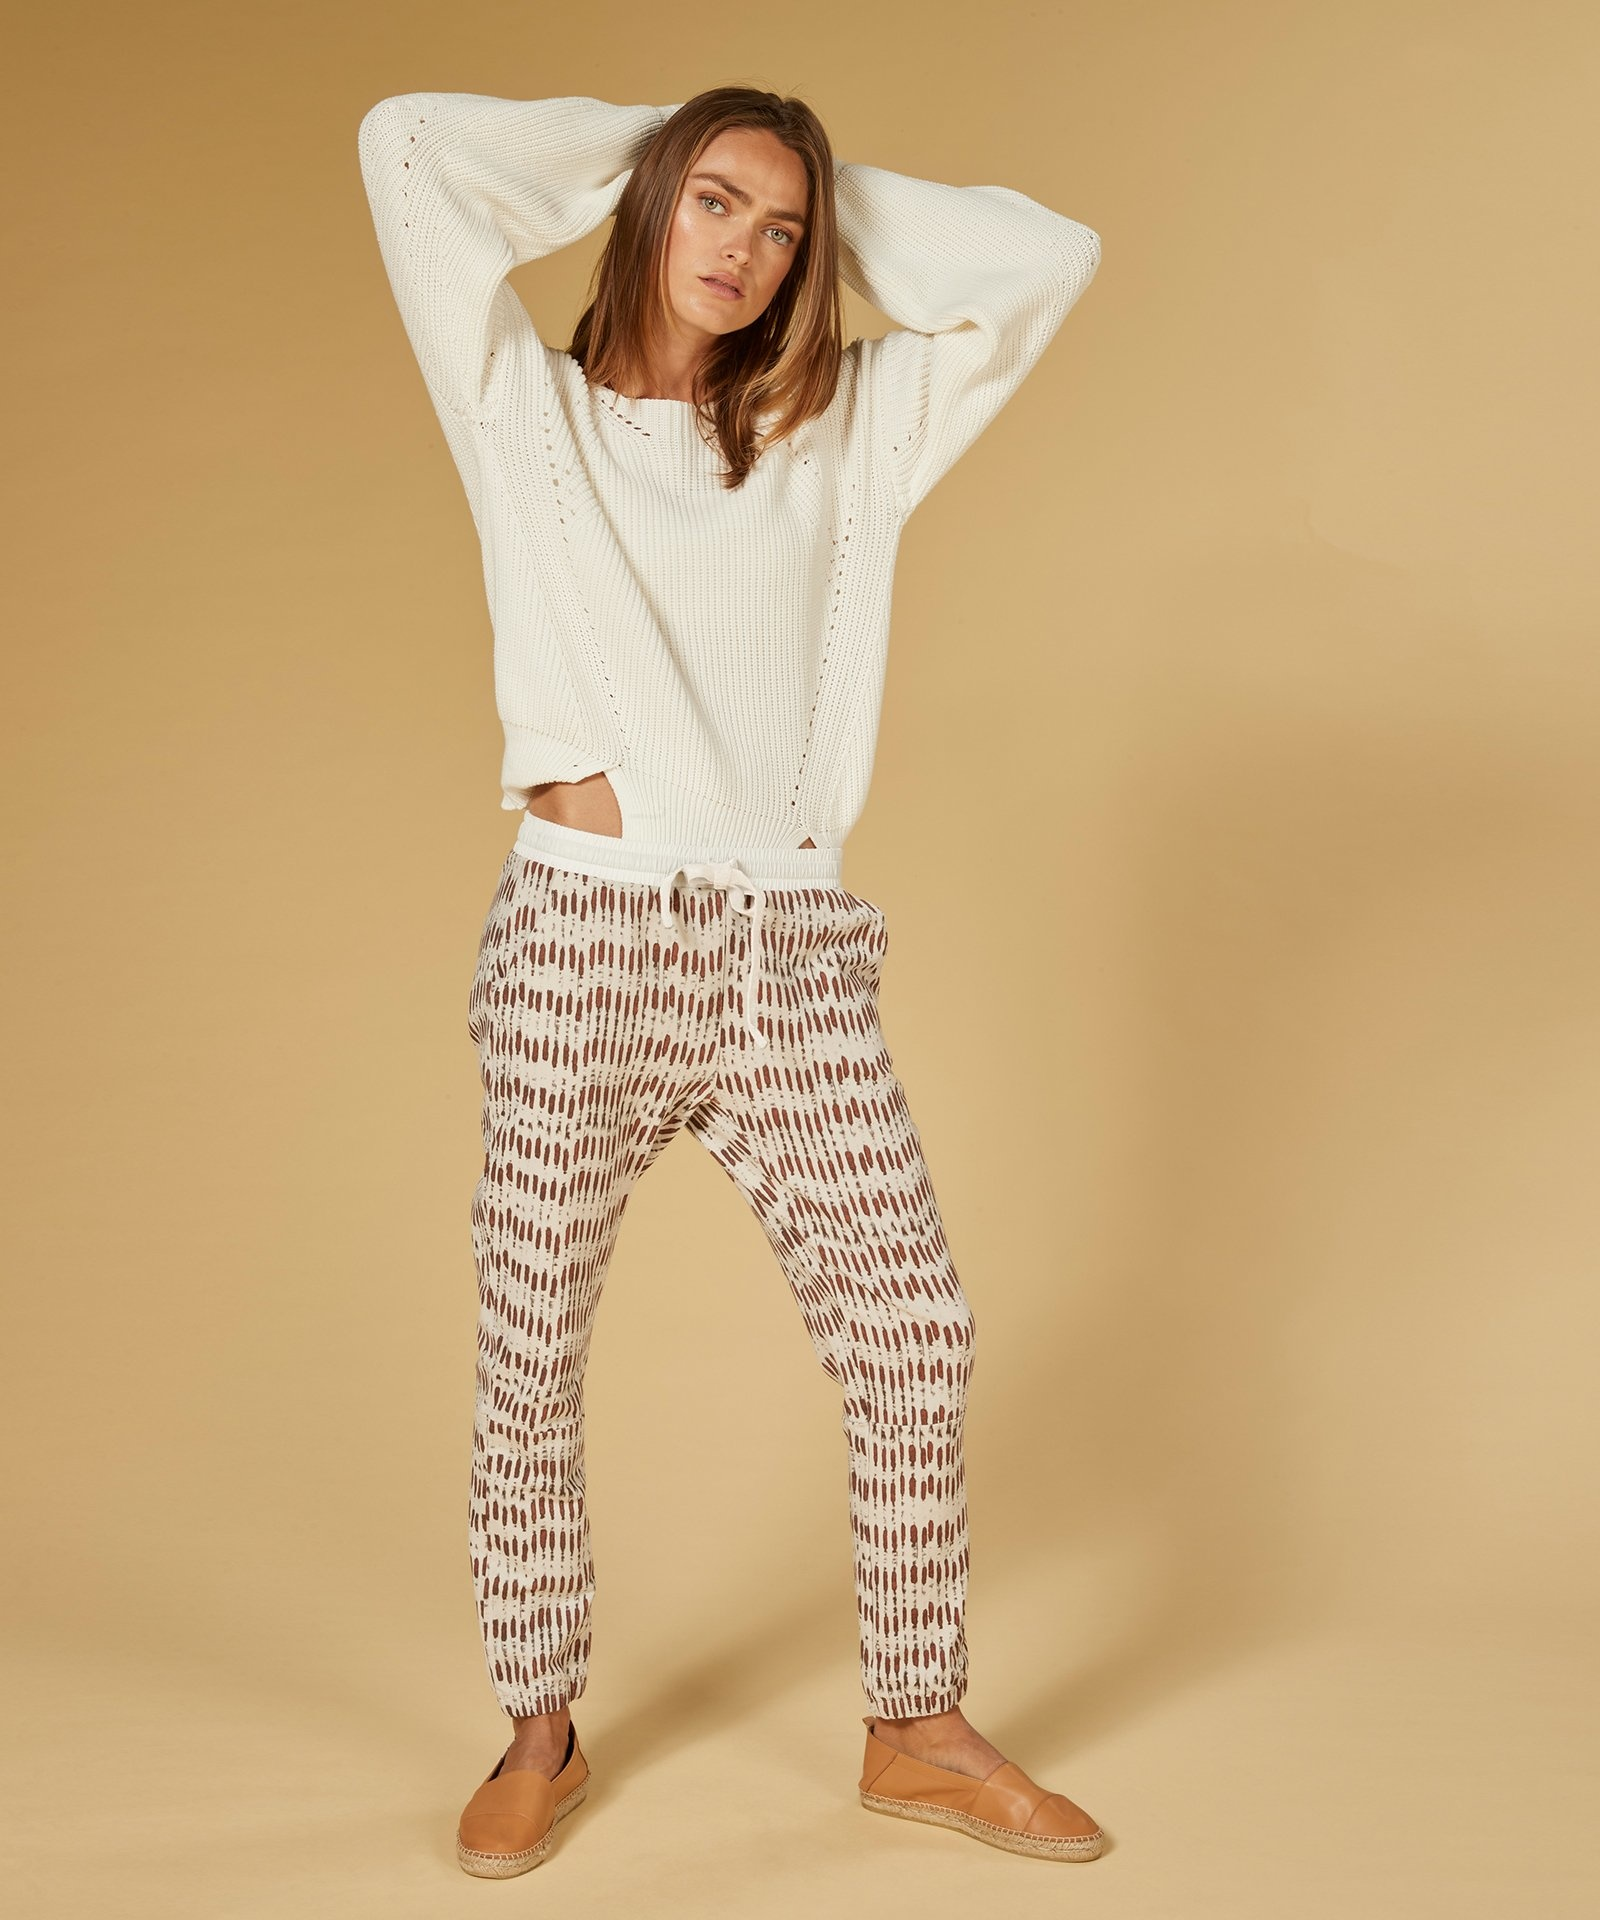 Trui sweater cotton knit white-6